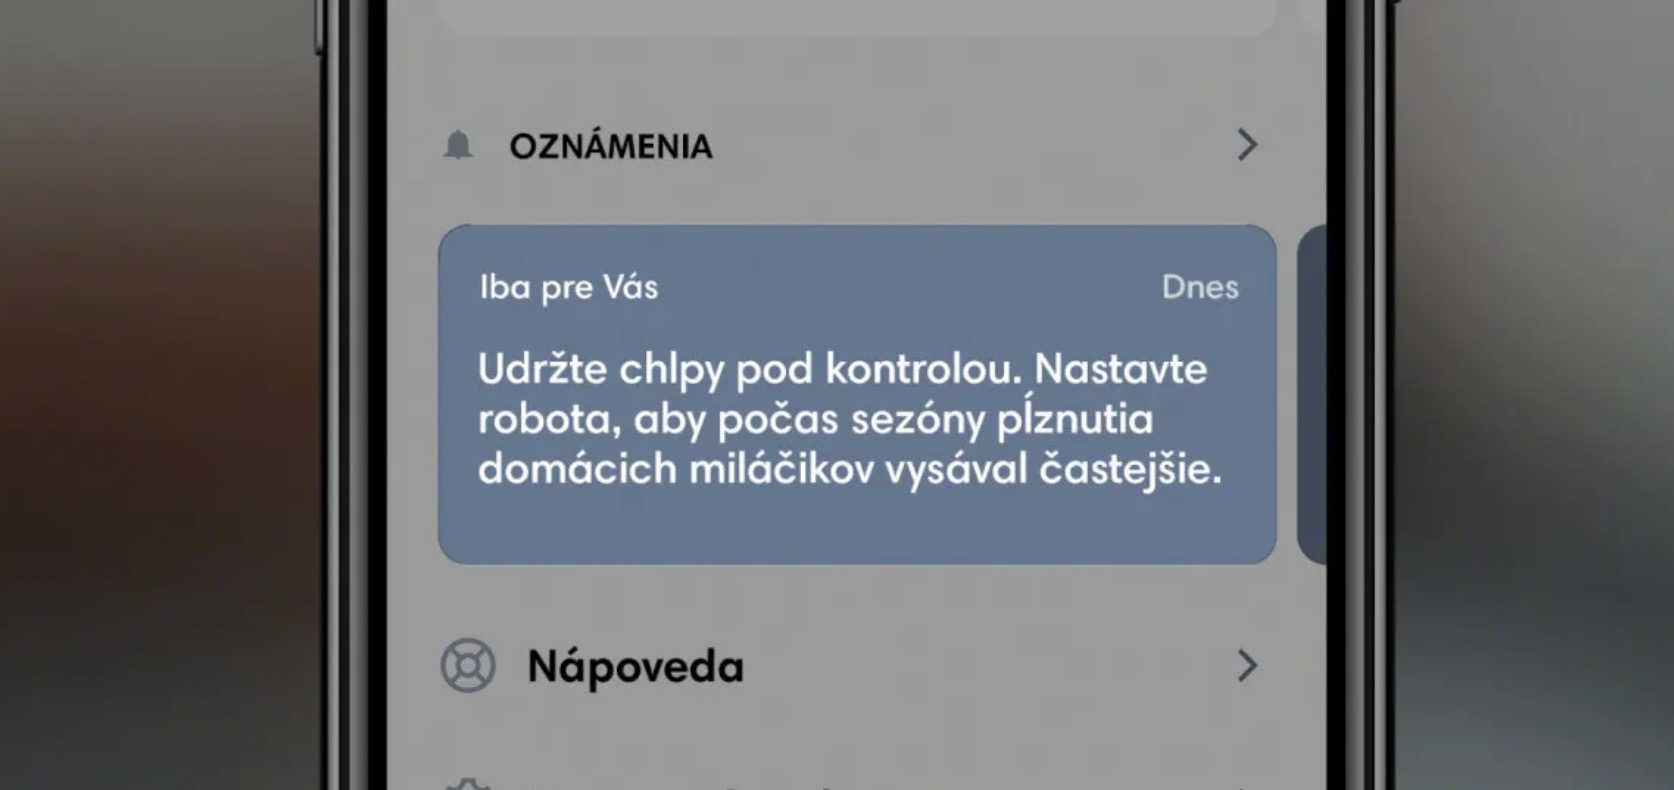 iRobot aplikacia